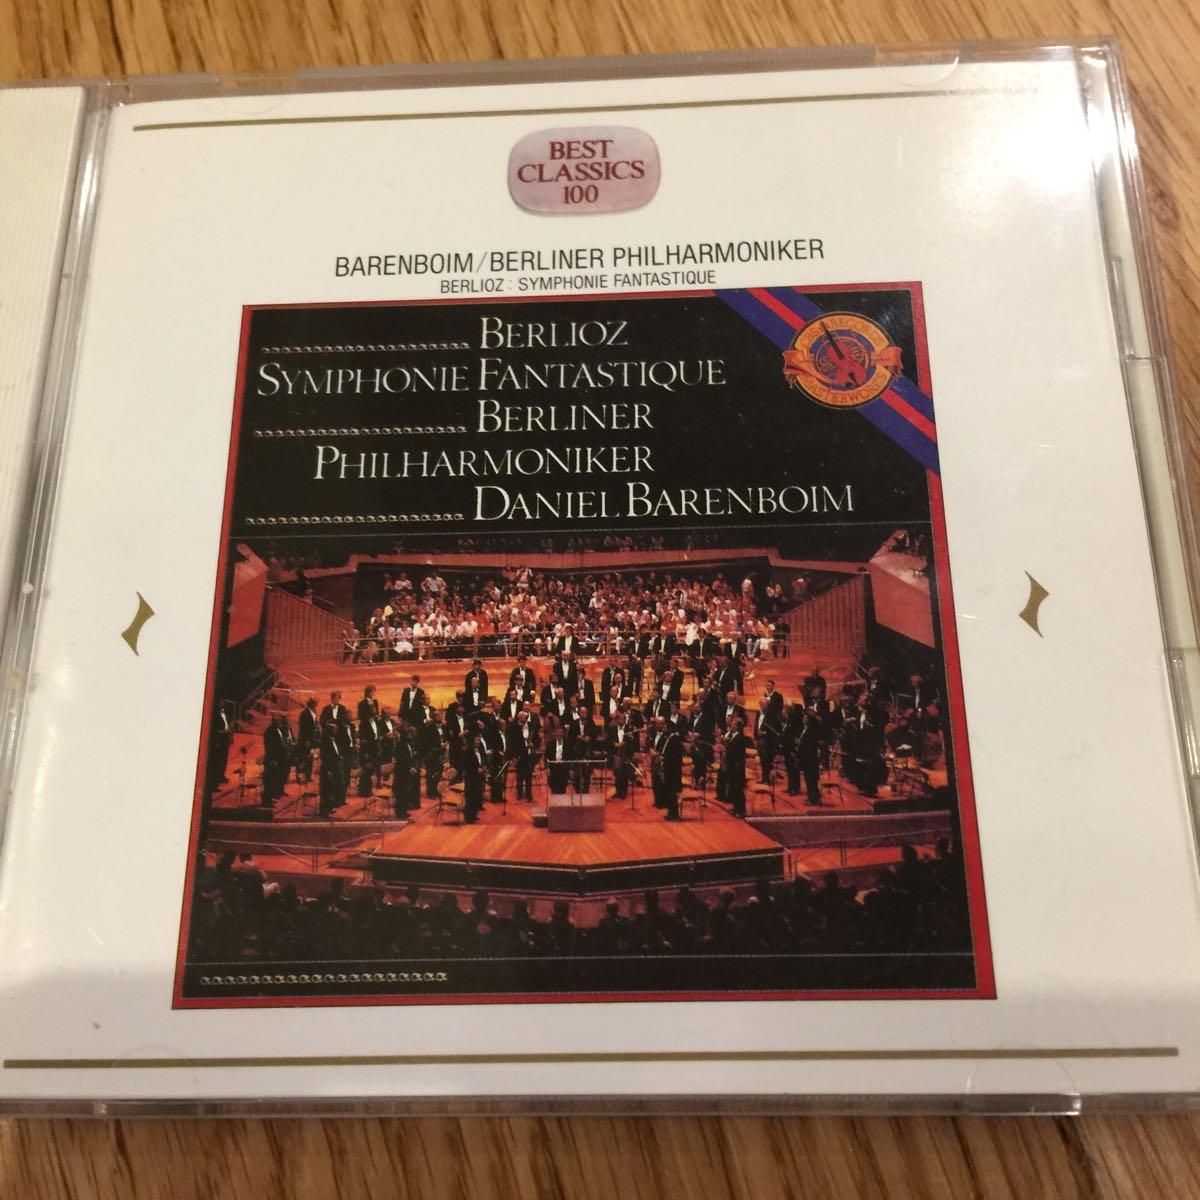 CD ベルリオーズ 交響曲 作品14a ダニエル・バレンボイム指揮 ベルリン・フィルハーモニー管弦楽団 BERLIOZ SYMPHONIES FANTASTIQUE_画像1